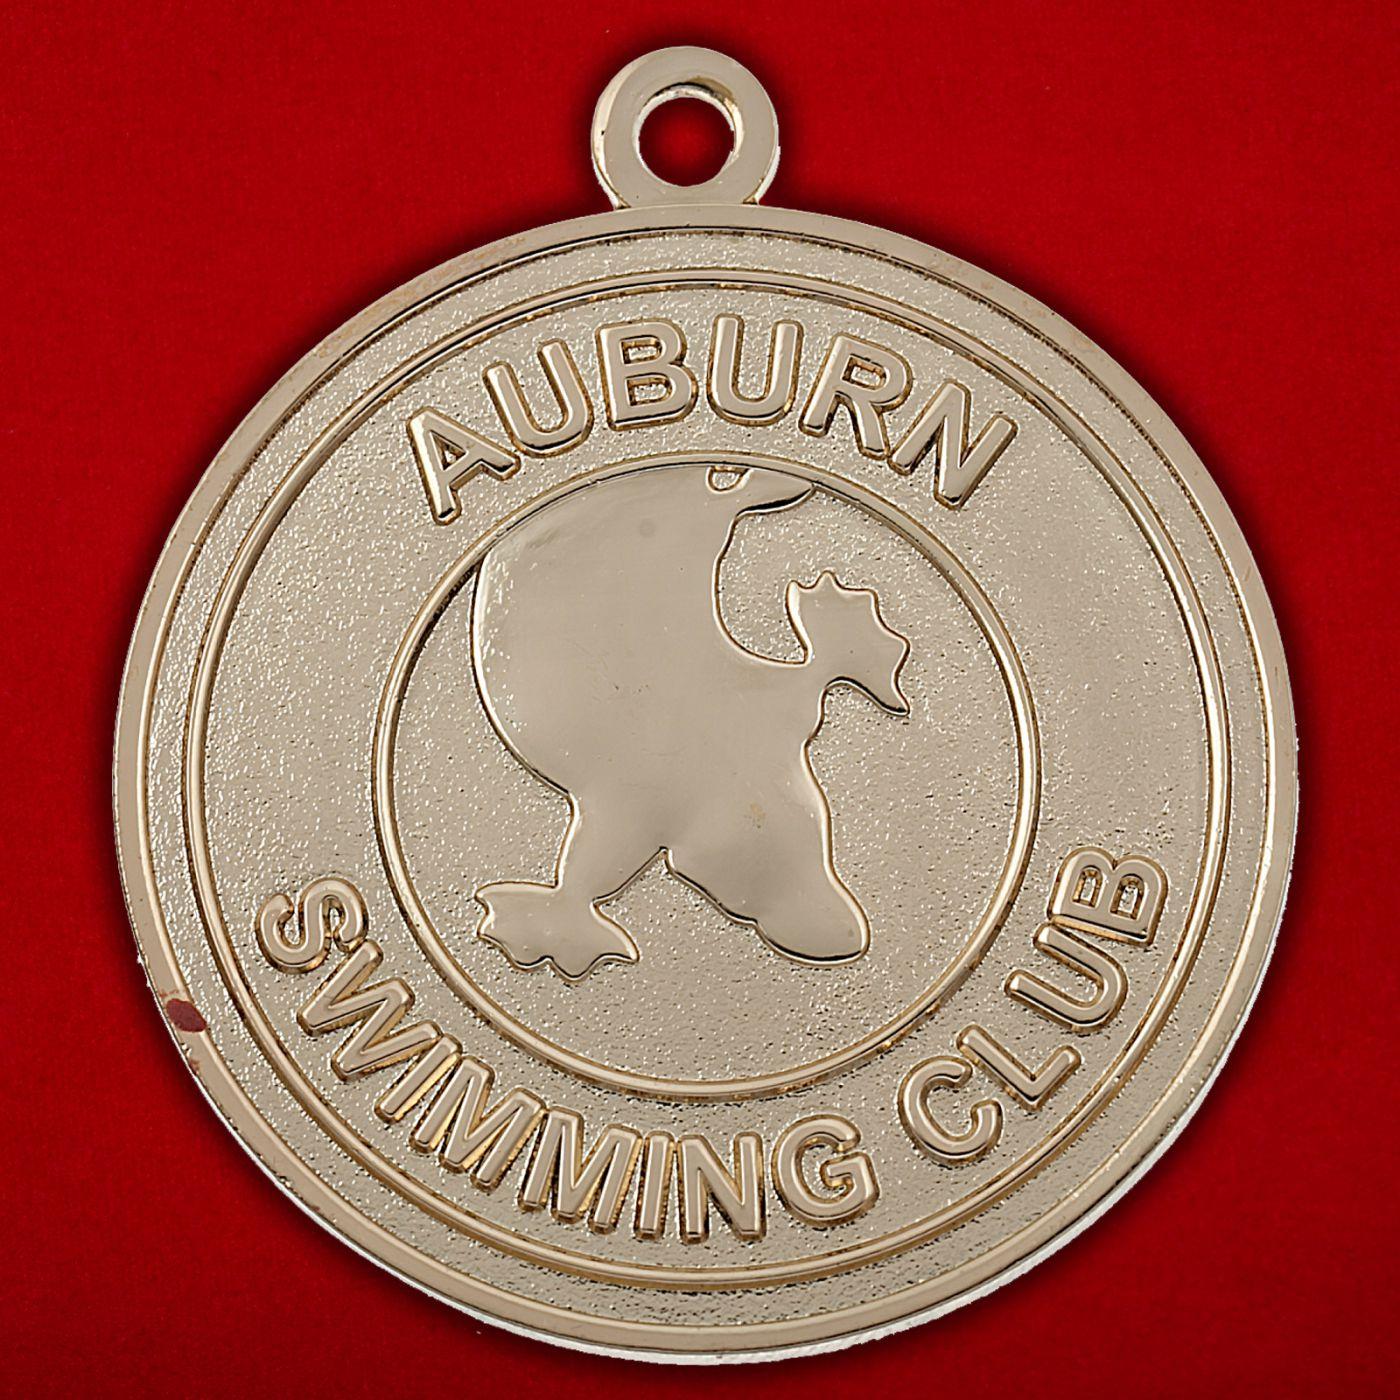 Медальон члена клуба пловцов Эйбурна, Австралия